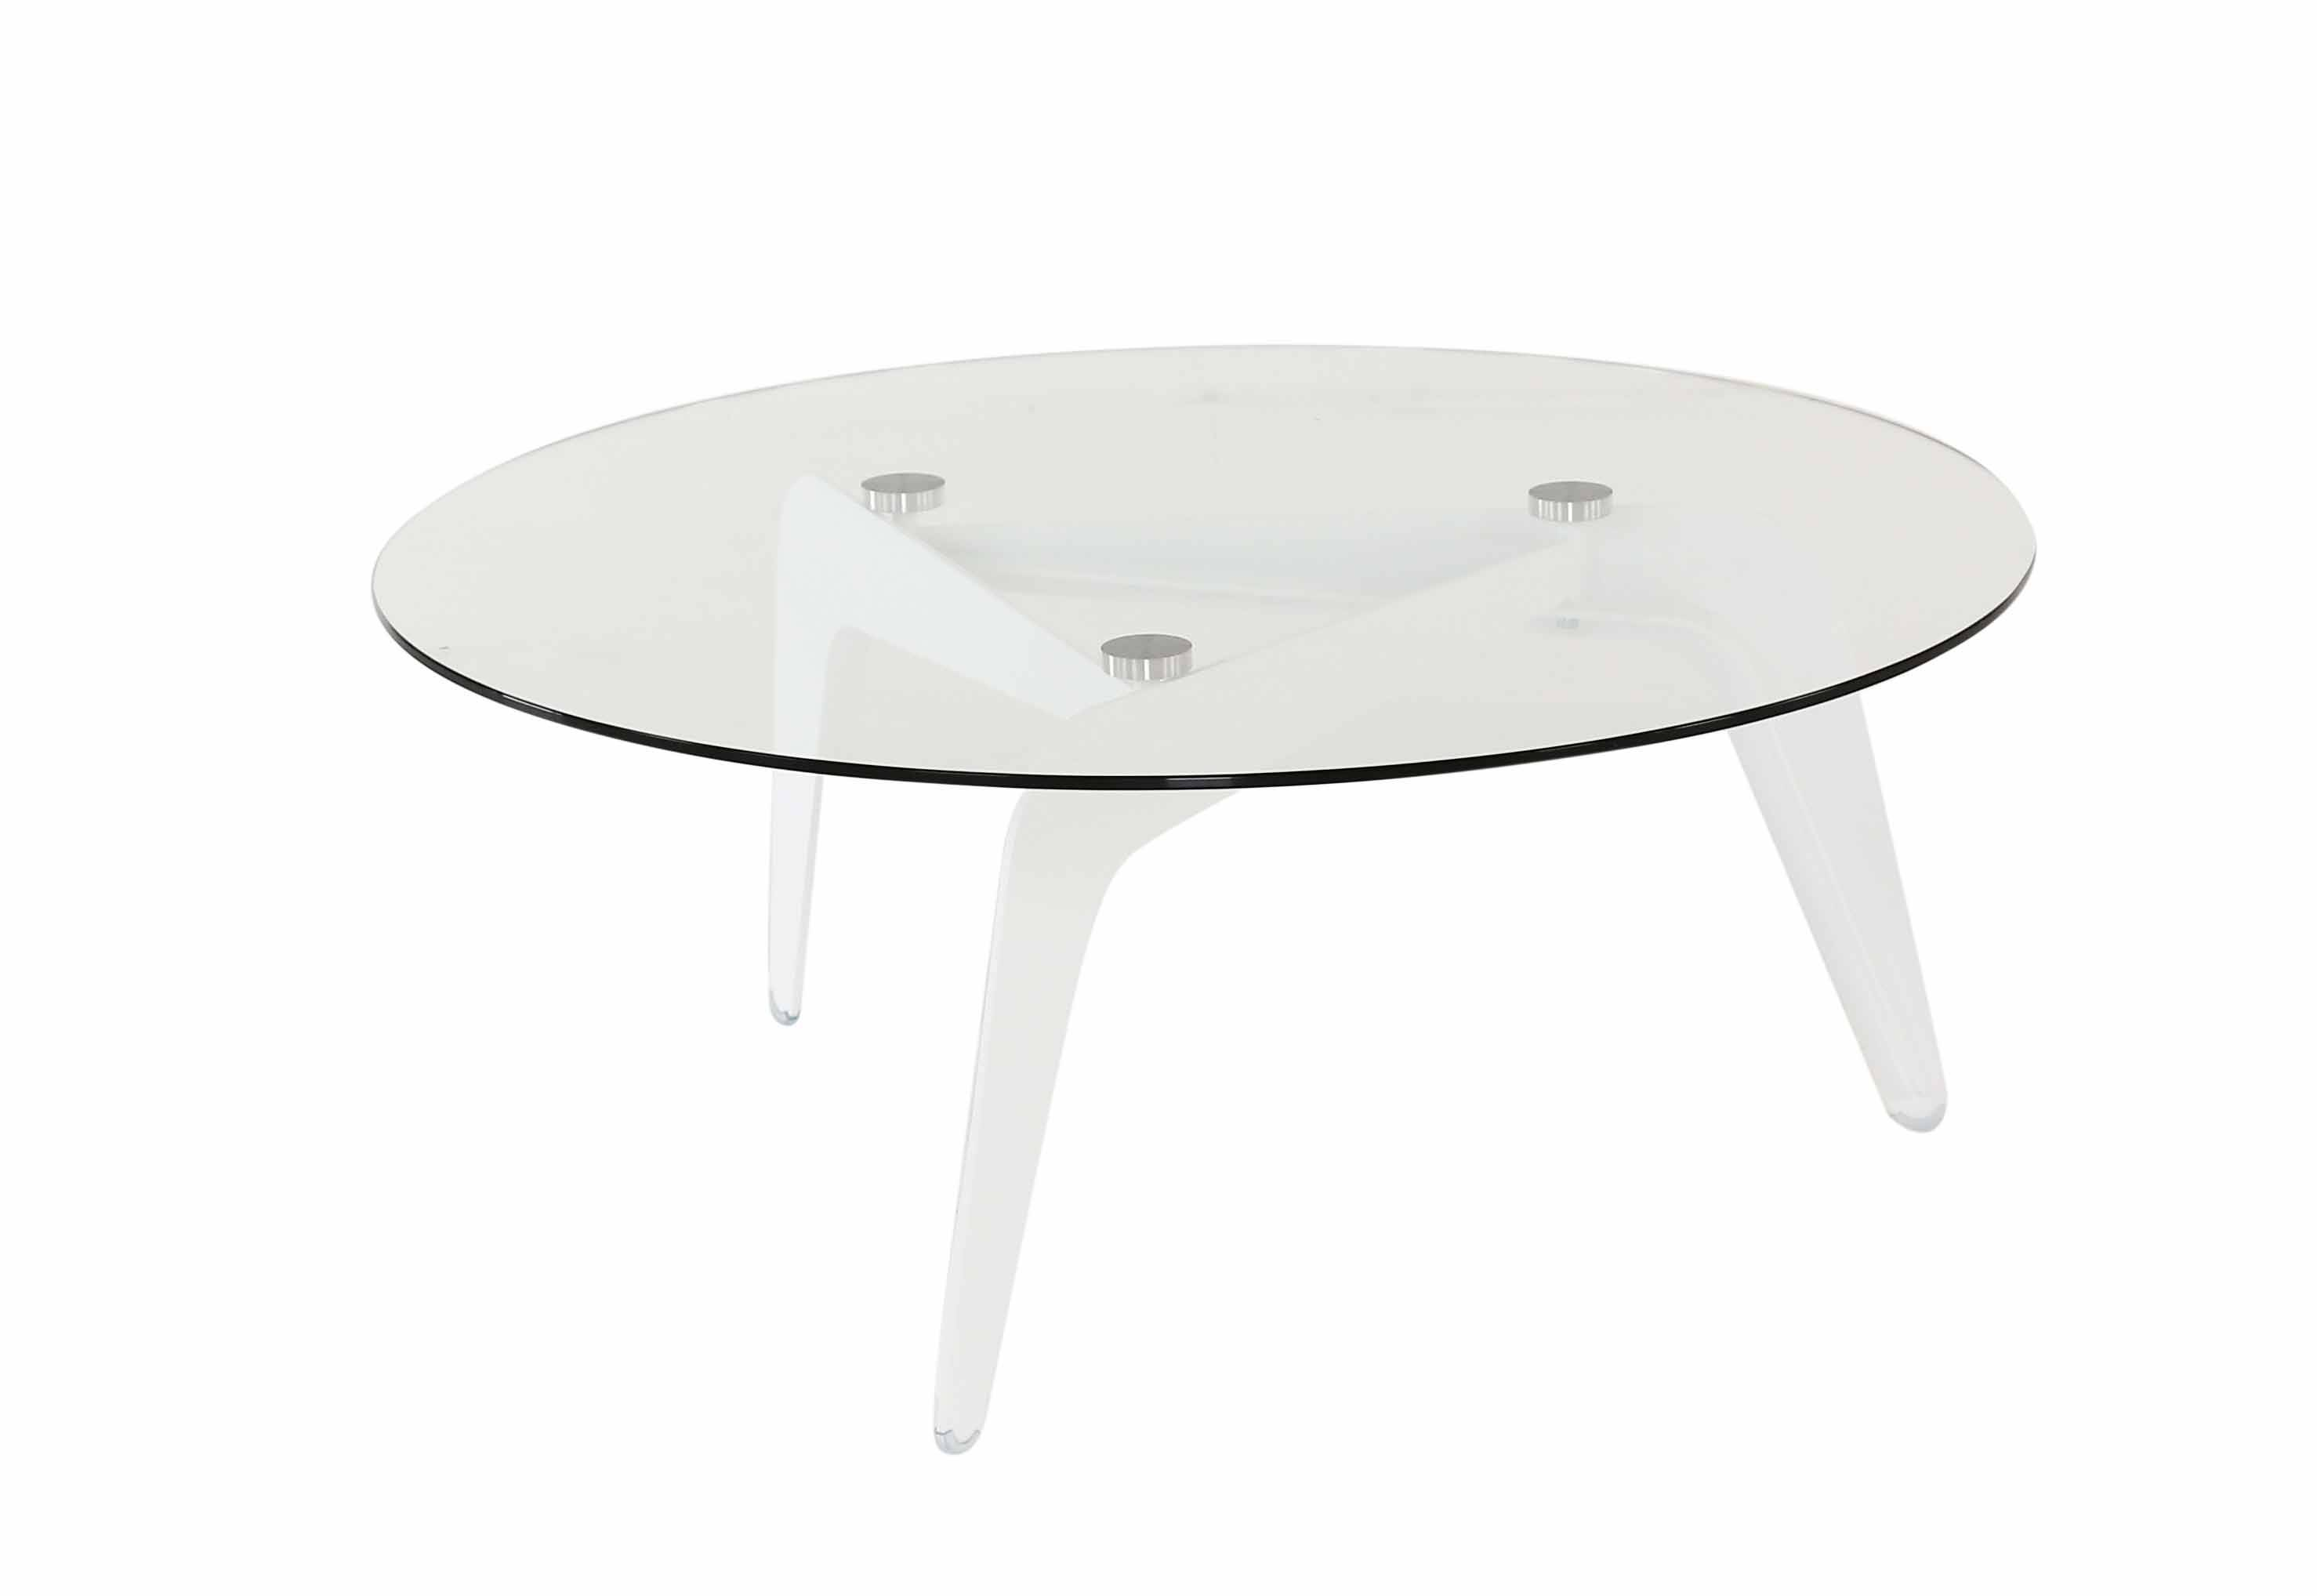 Zago 'Table basse ronde verre et métal Ø96 cm Cald - ZAGO'